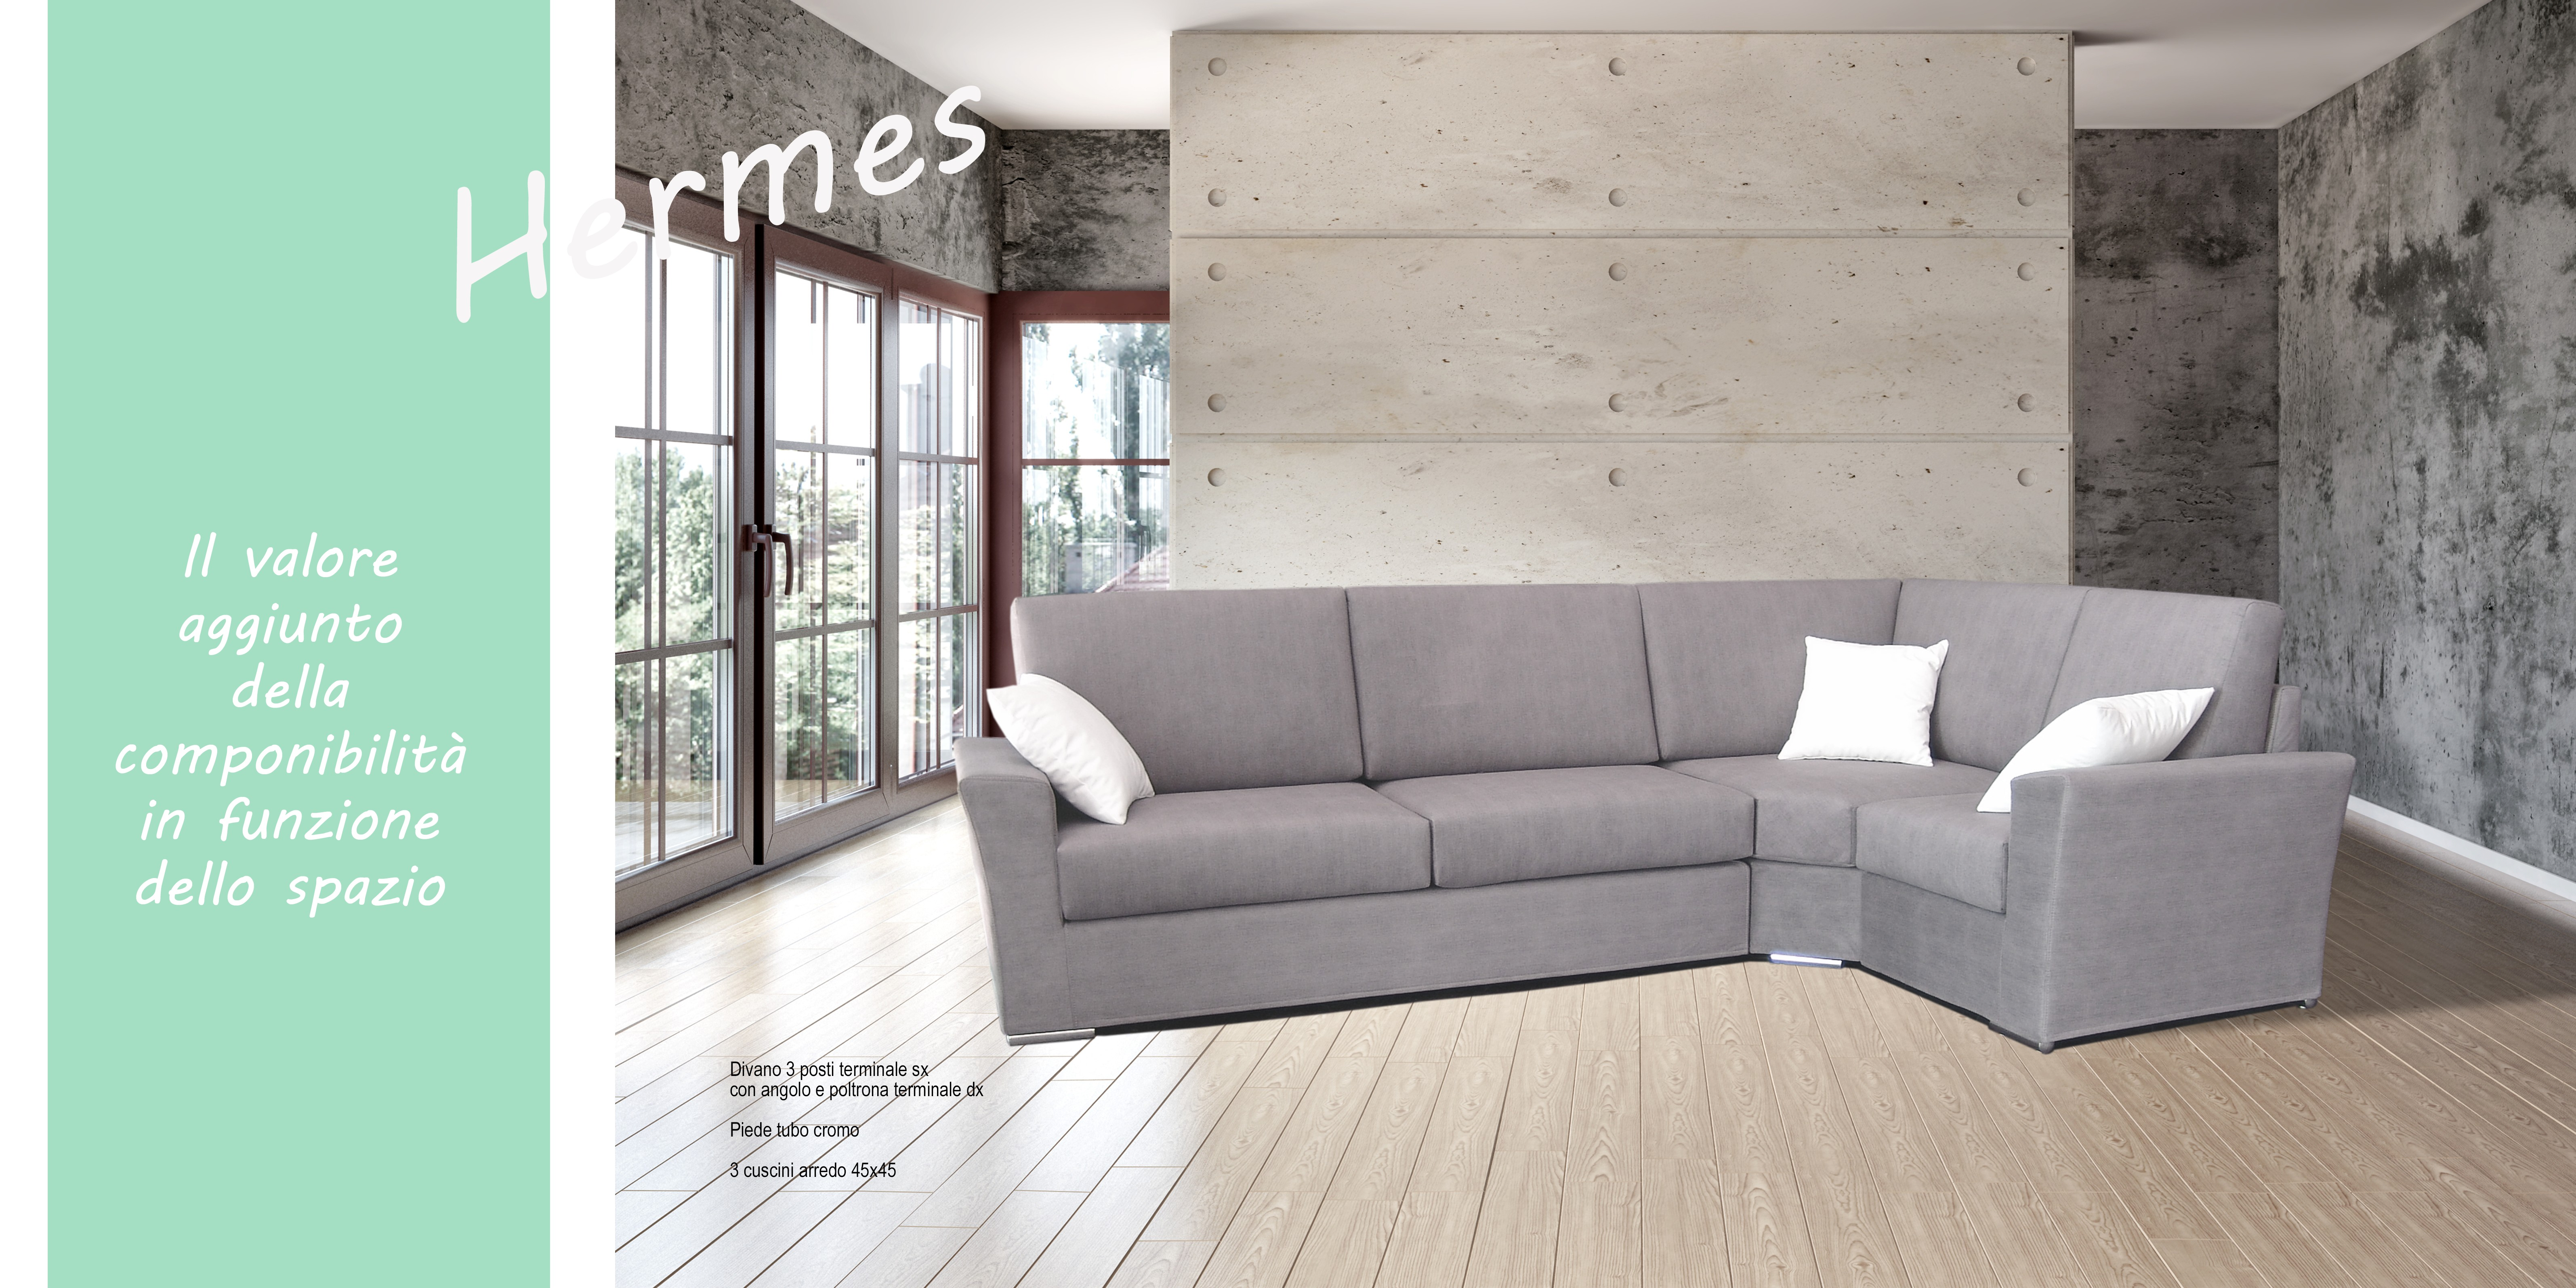 Sofa | 2017 | HERMES